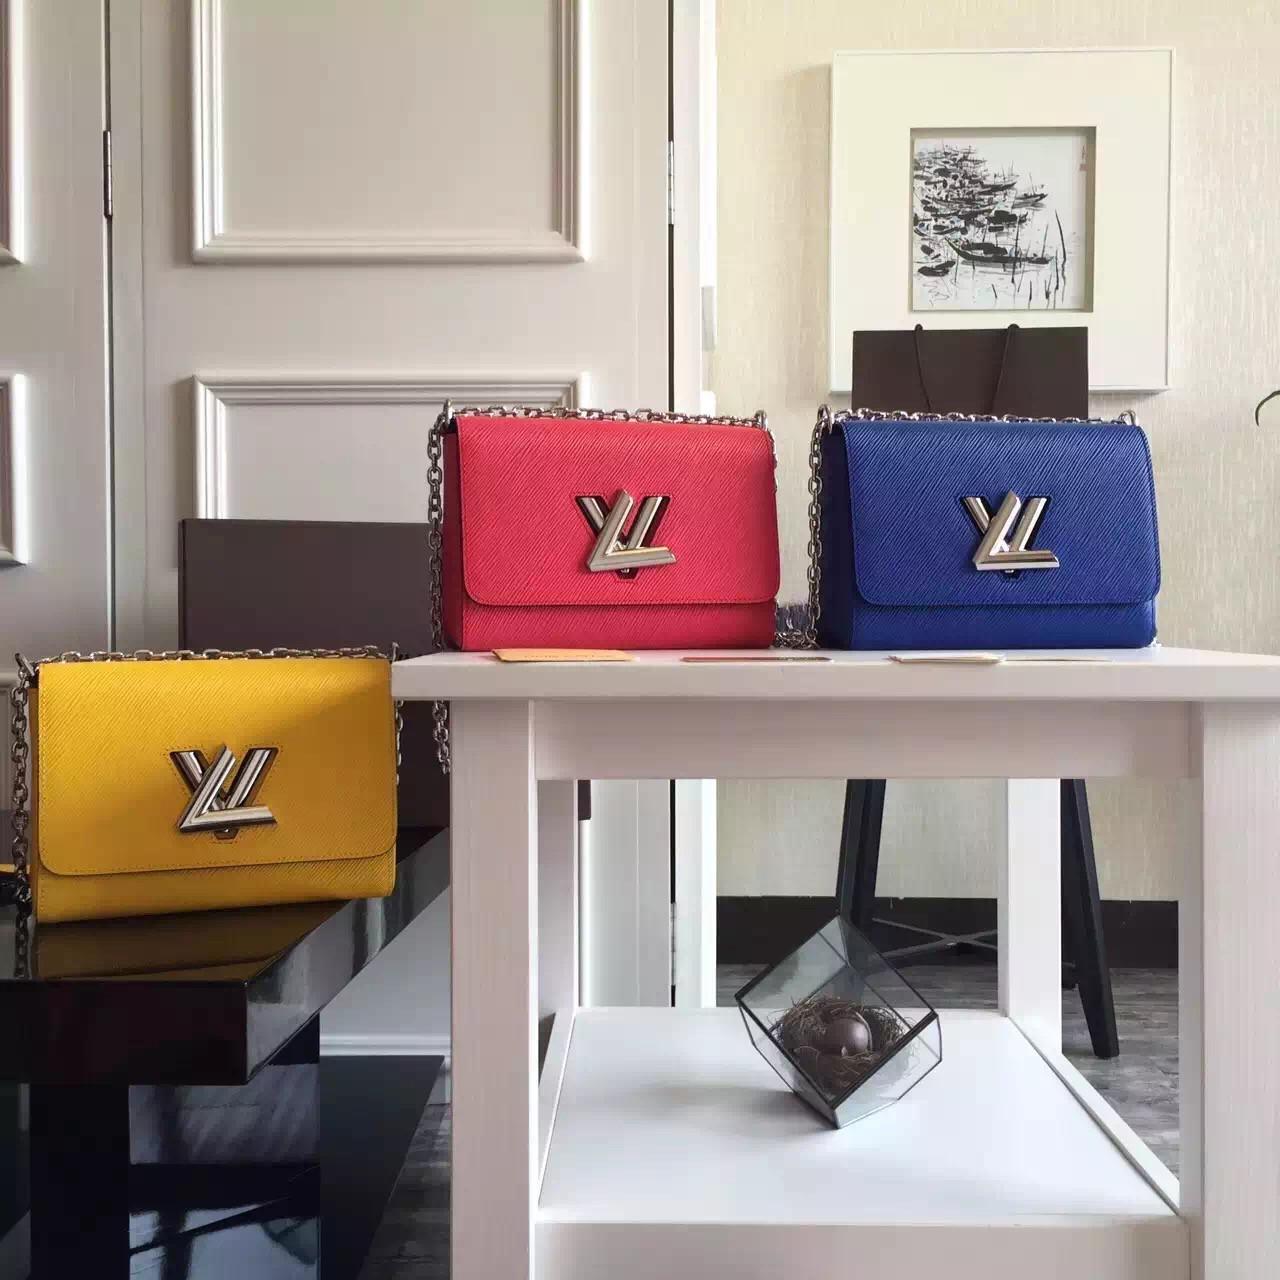 253ca6235271 Сумки Луи Виттон копия интернет - Louis Vuitton Twist | vkstore.com.ua